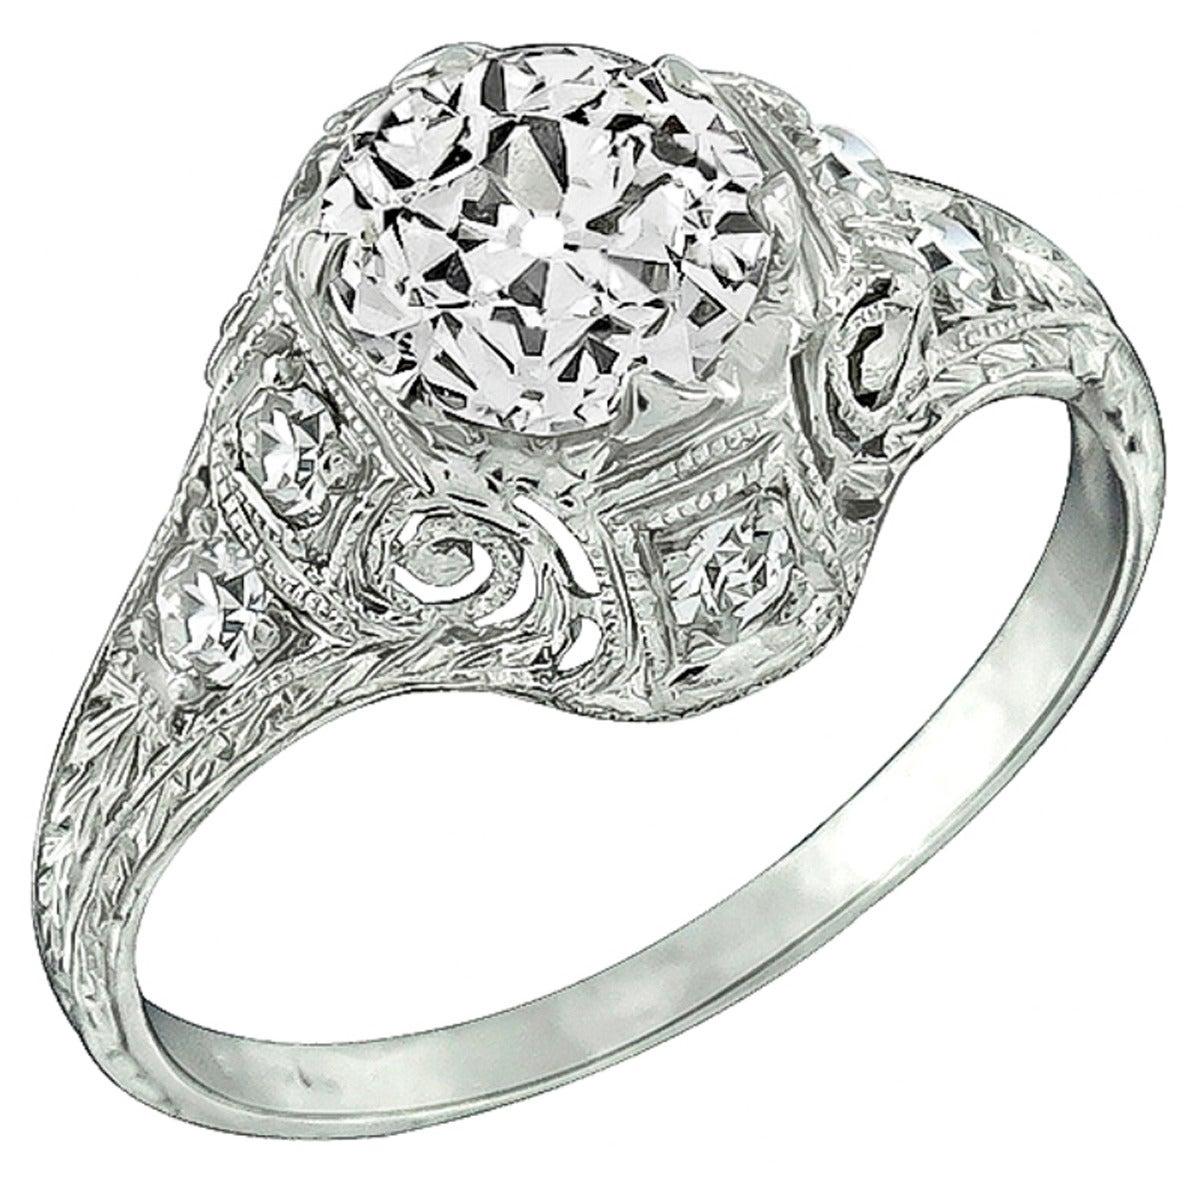 Edwardian 1 Carat Diamond Platinum Engagement Ring